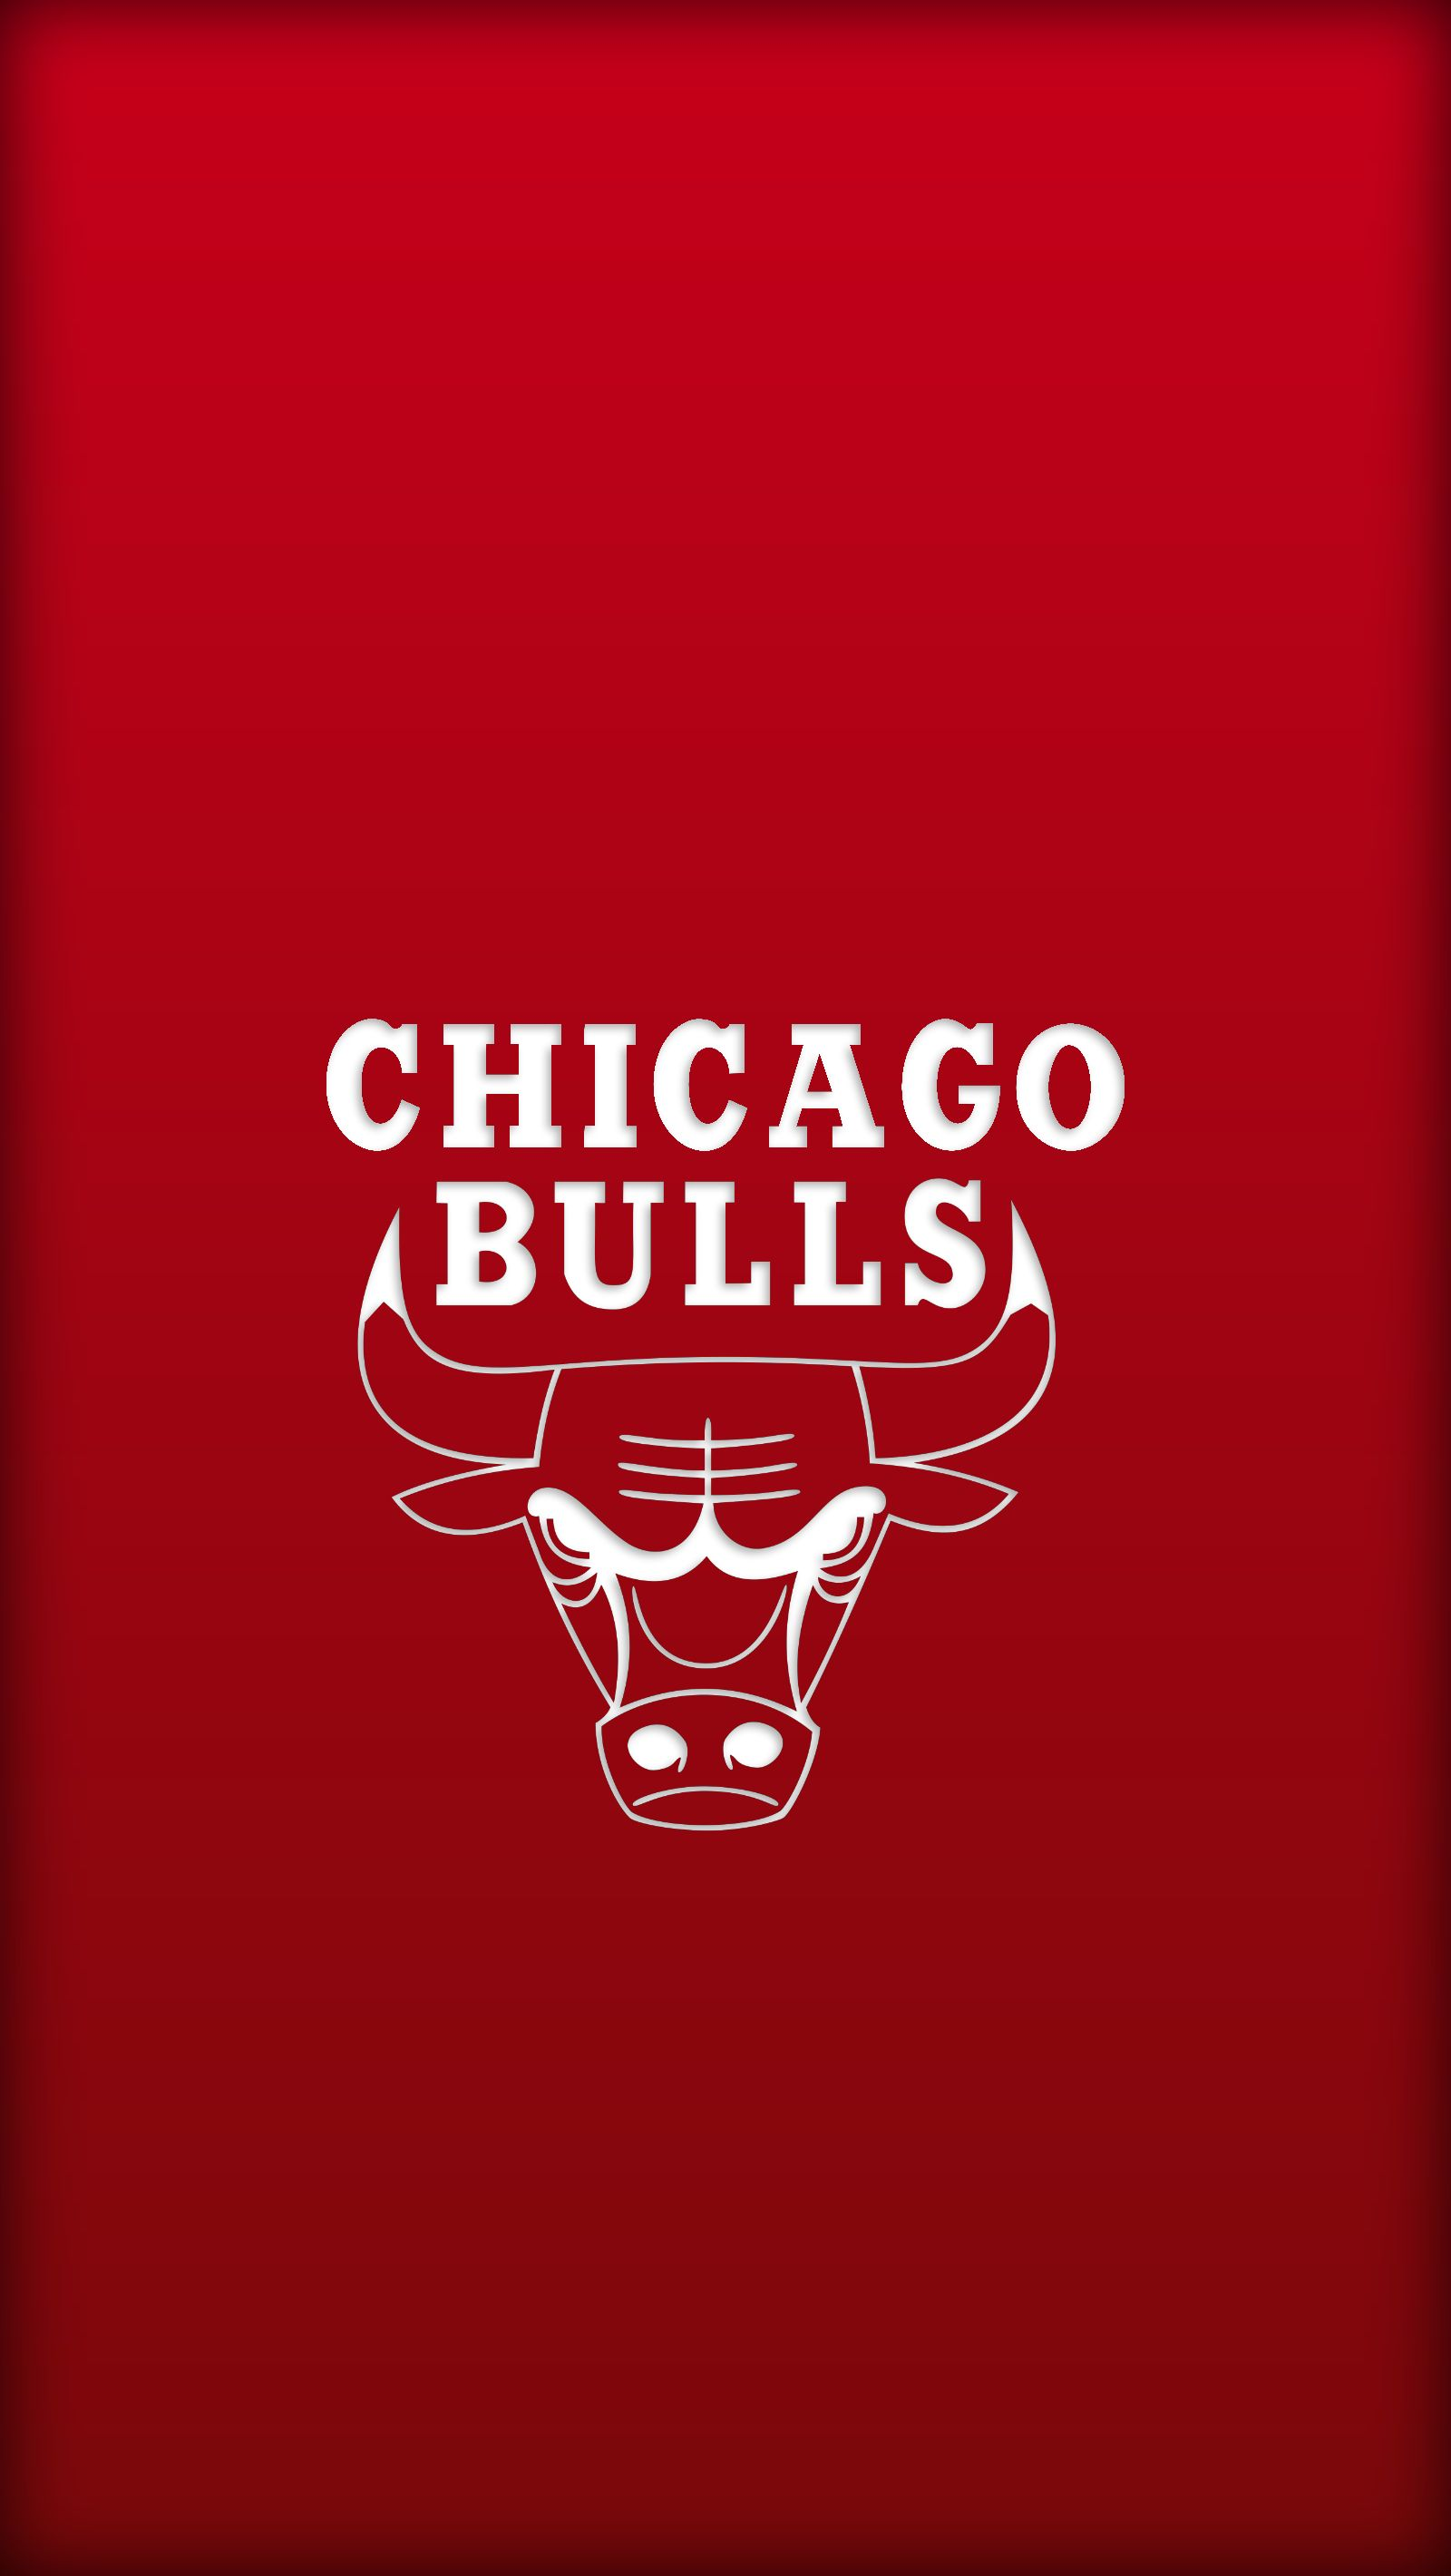 Sportsign Shop Redbubble Chicago Bulls Wallpaper Chicago Bulls Basketball Chicago Bulls